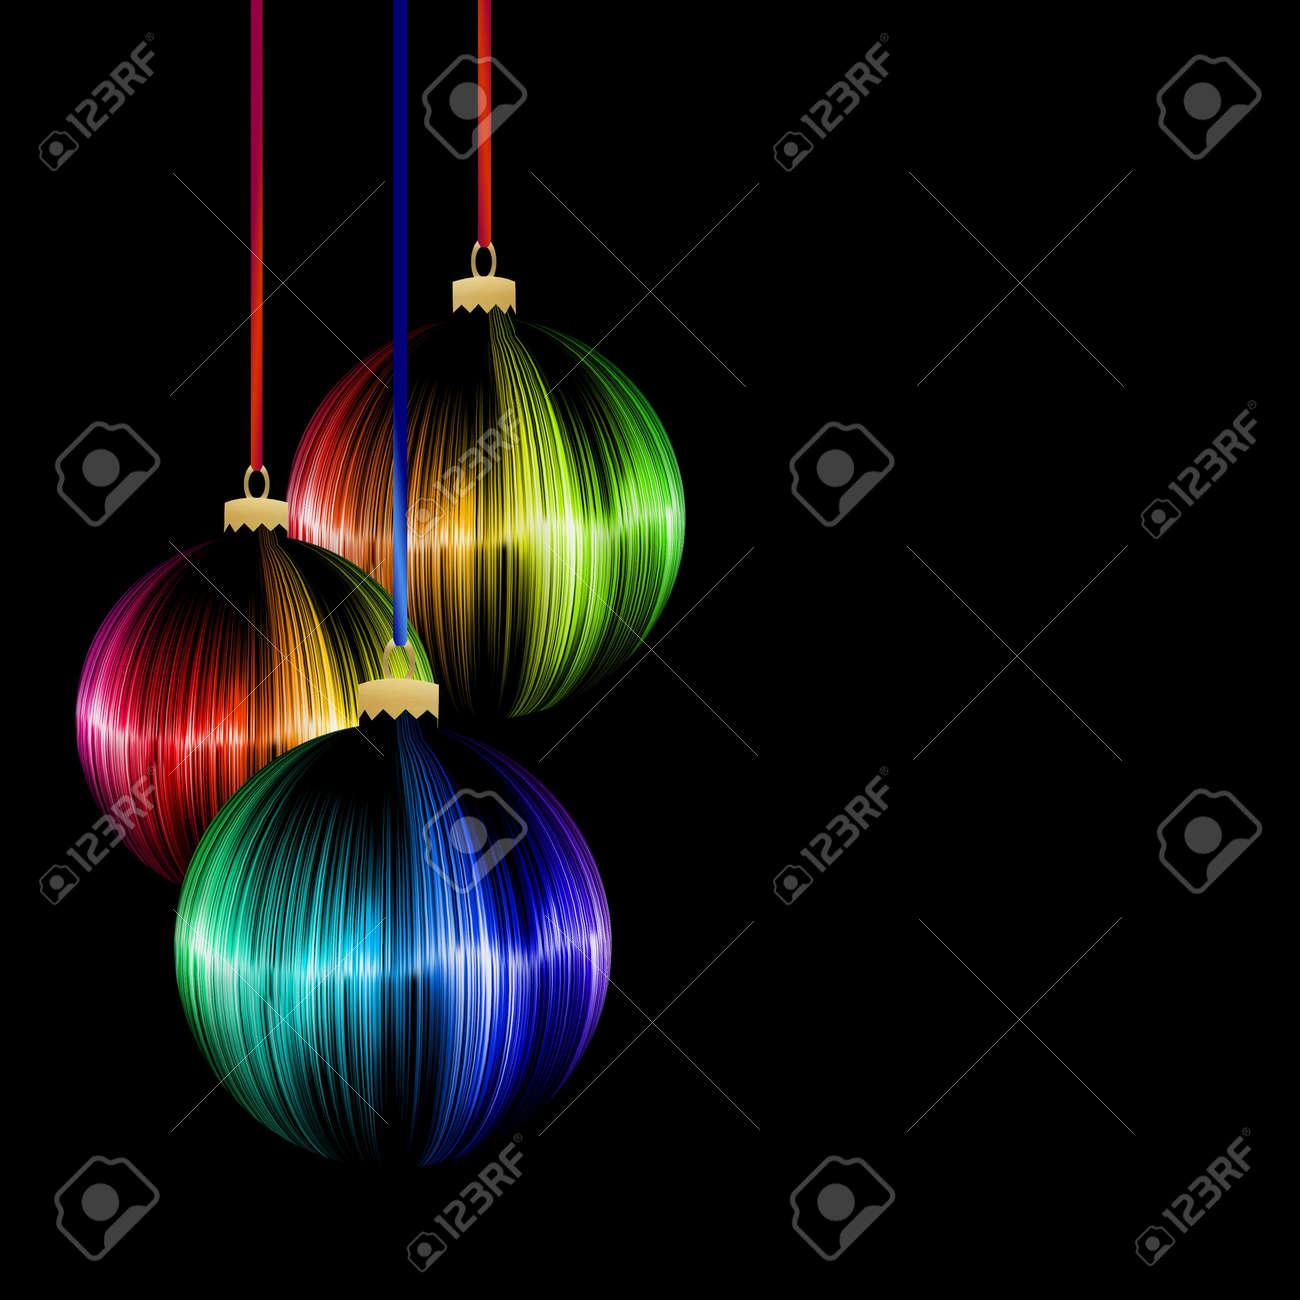 rainbow Christmas ball on dark background Stock Photo - 15947671